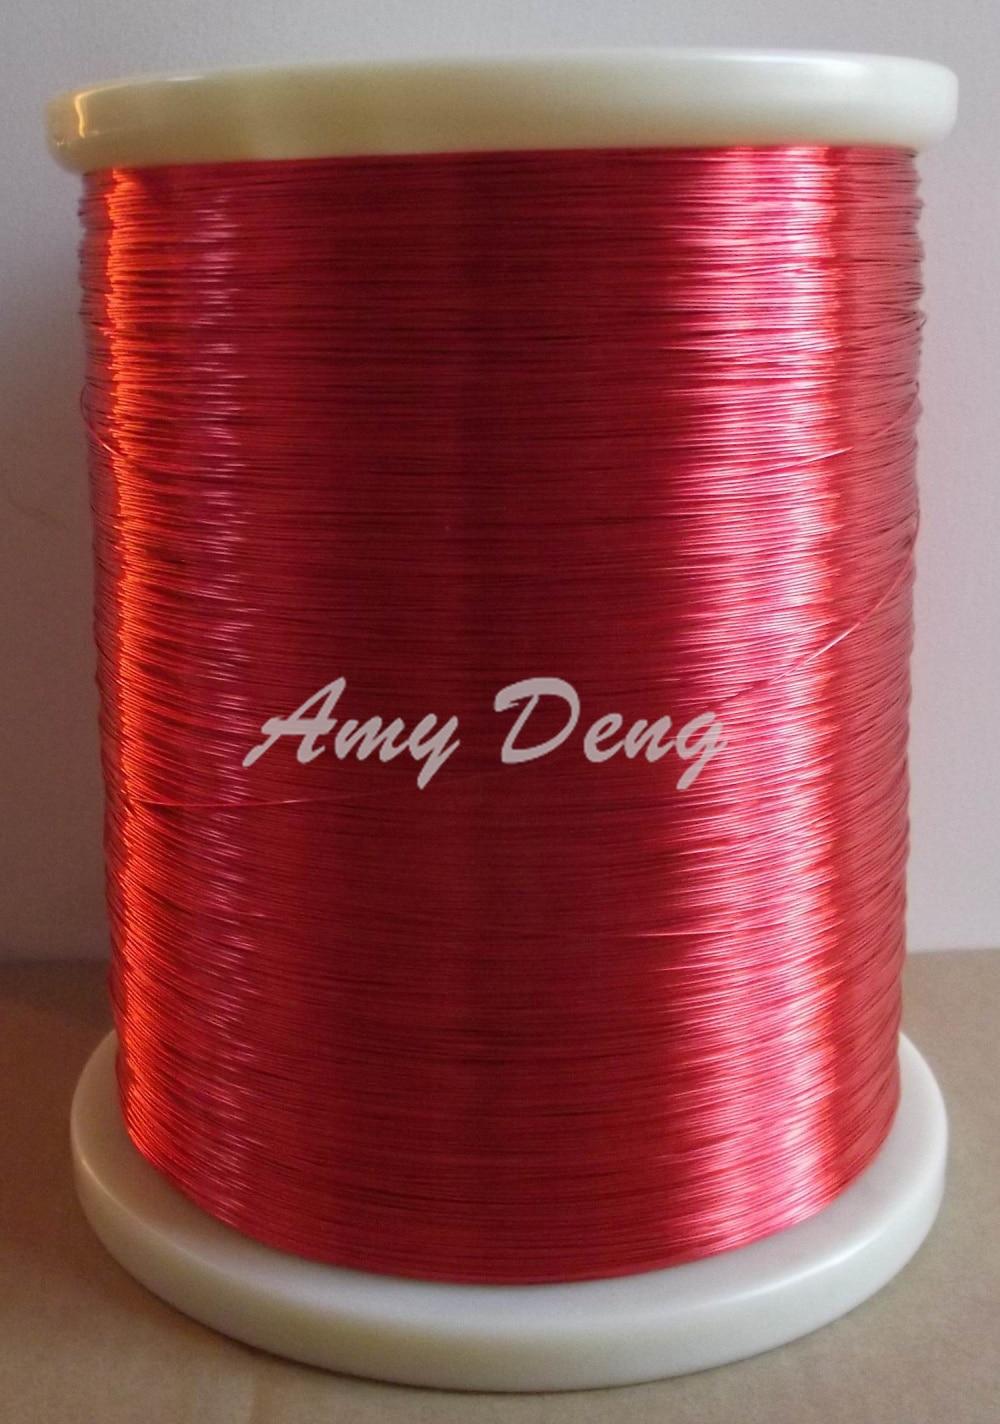 500 meters/lot  0.3 mm new polyurethane enamel covered wire QA-1-155 copper wire red enamel covered wire